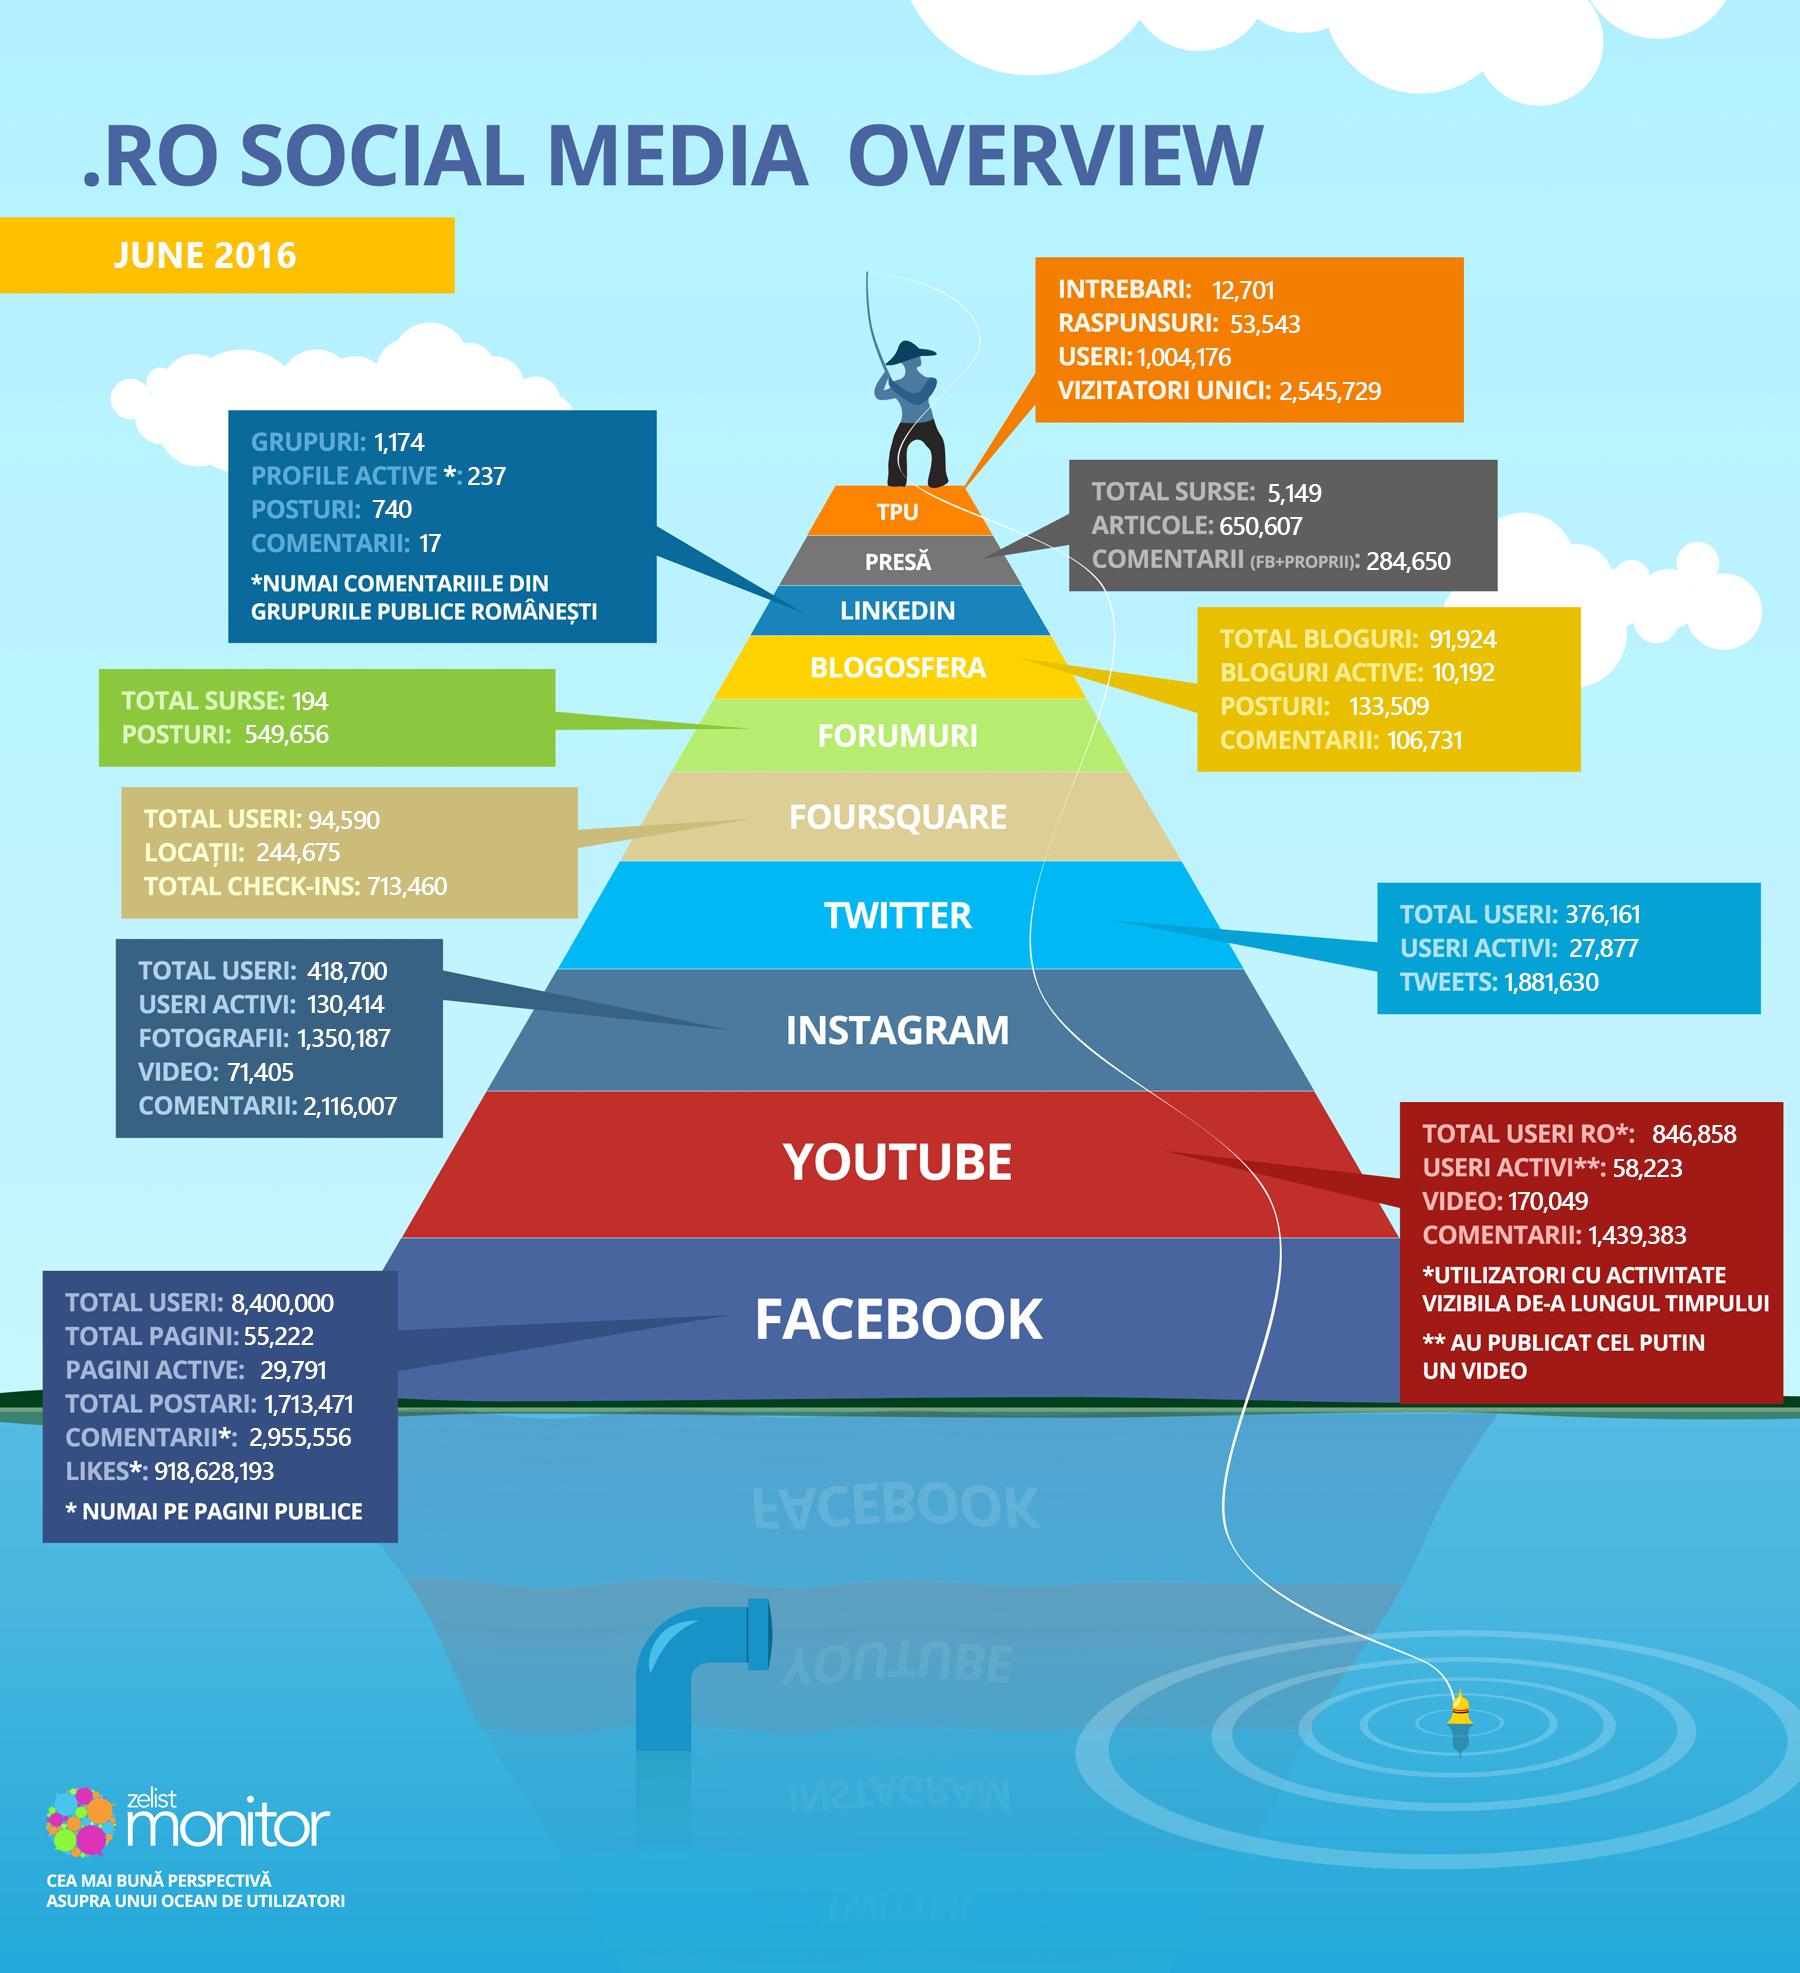 infographic_piramida_iunie_2016 (2)